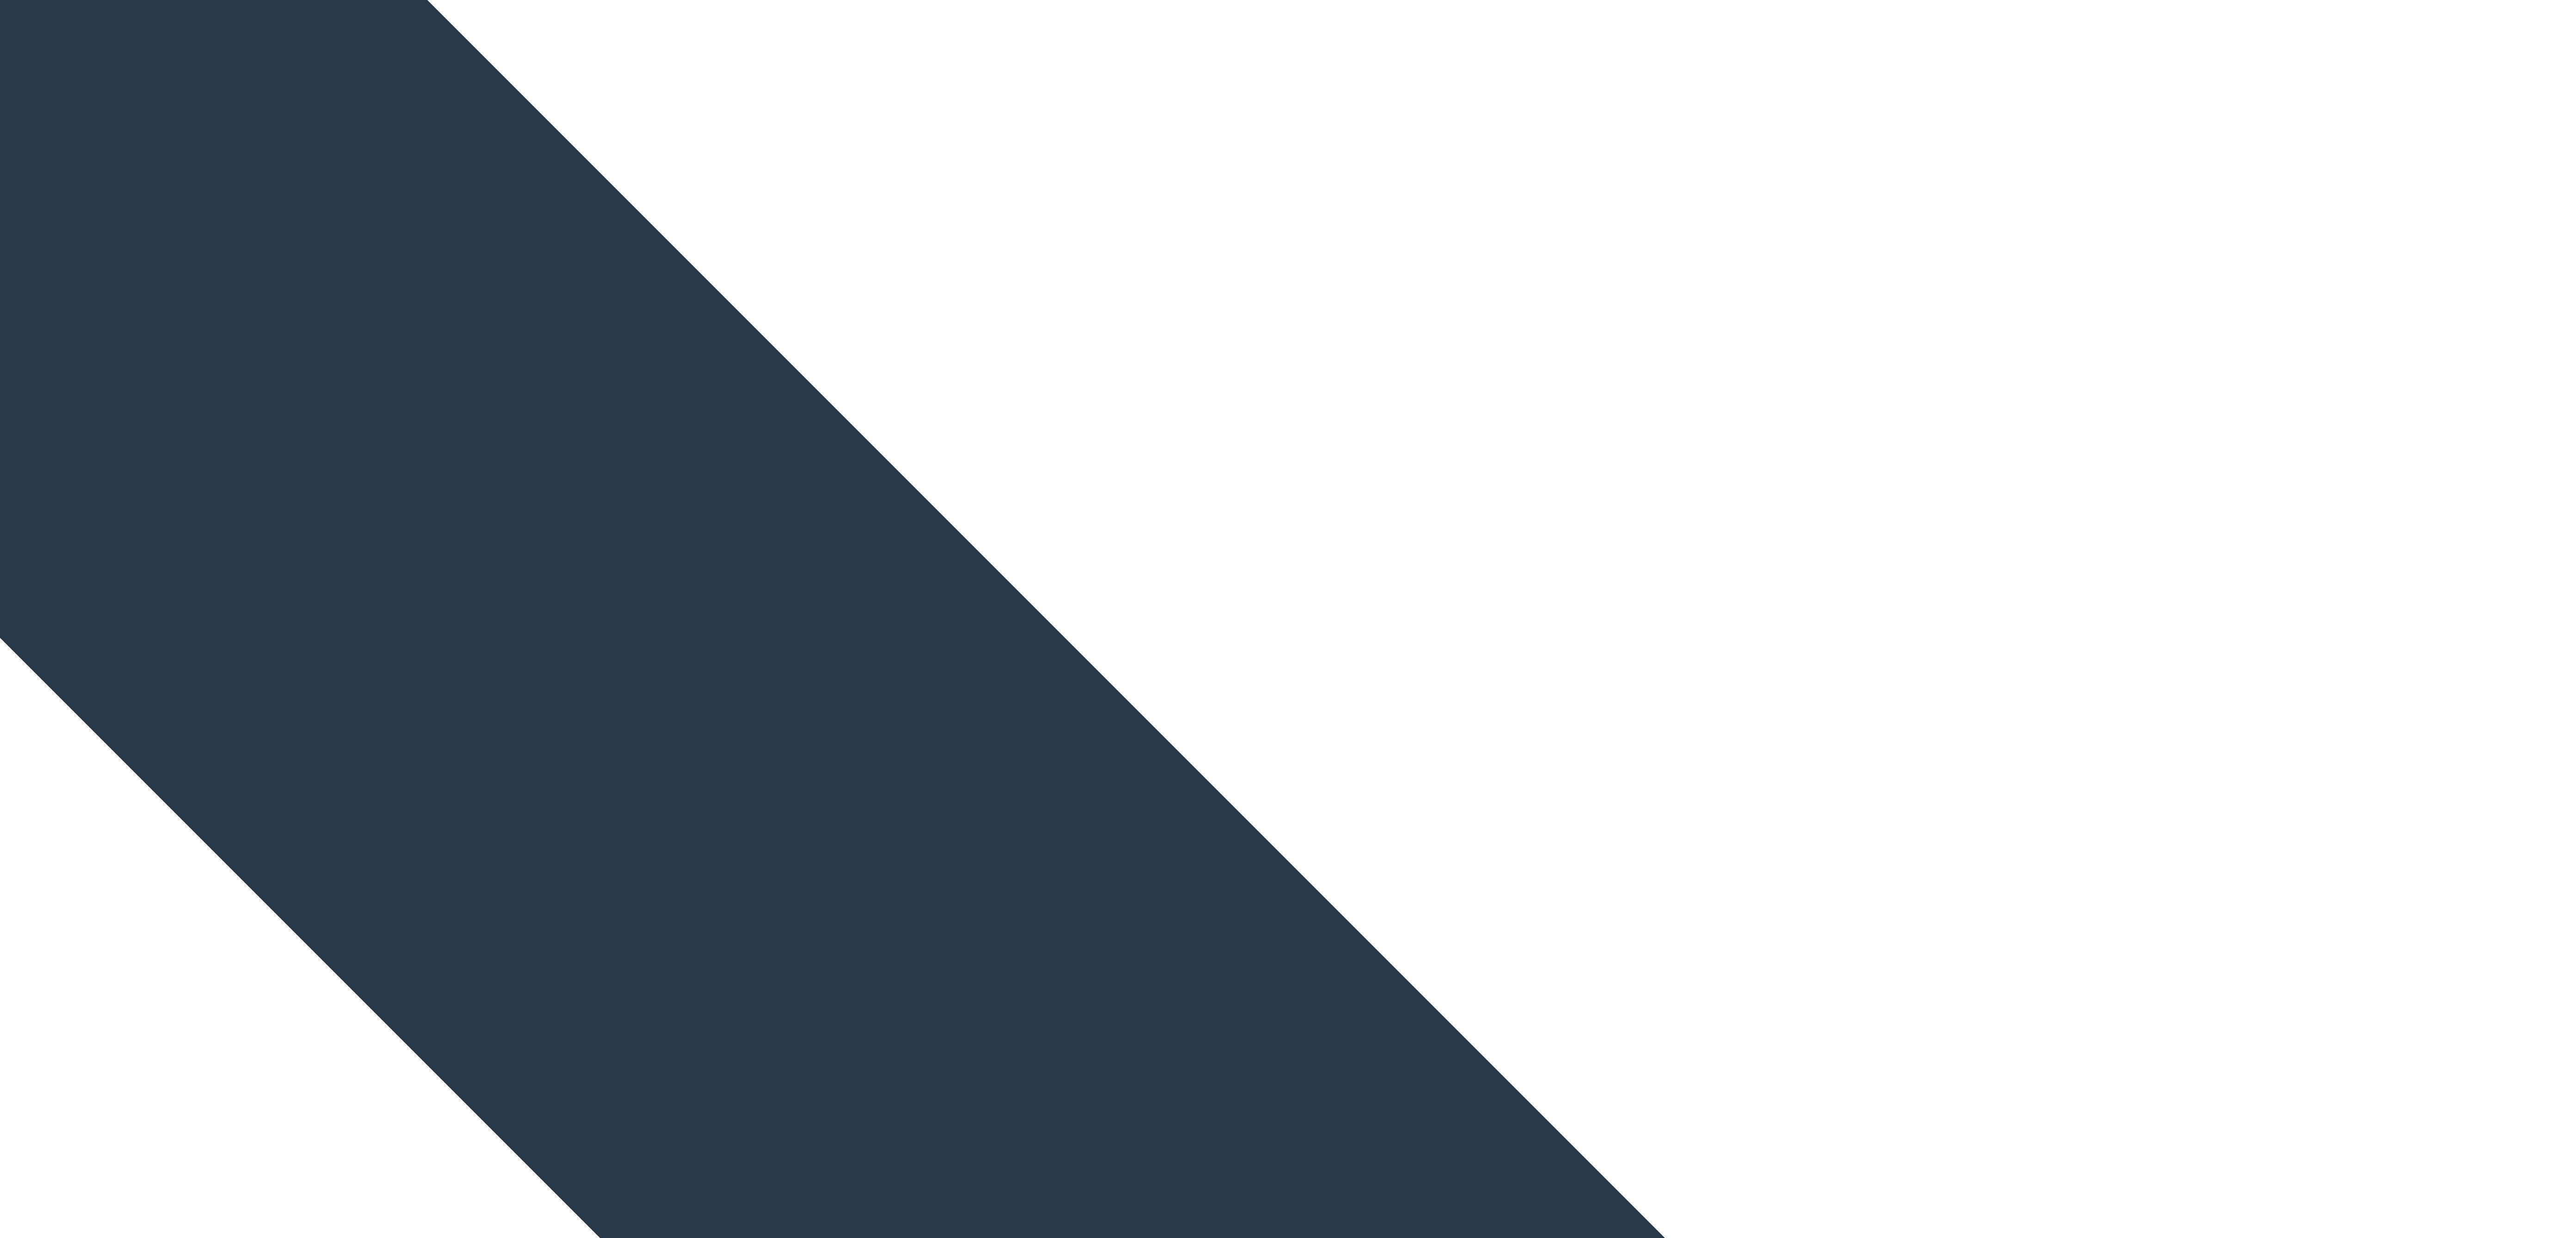 Blue stripe animation